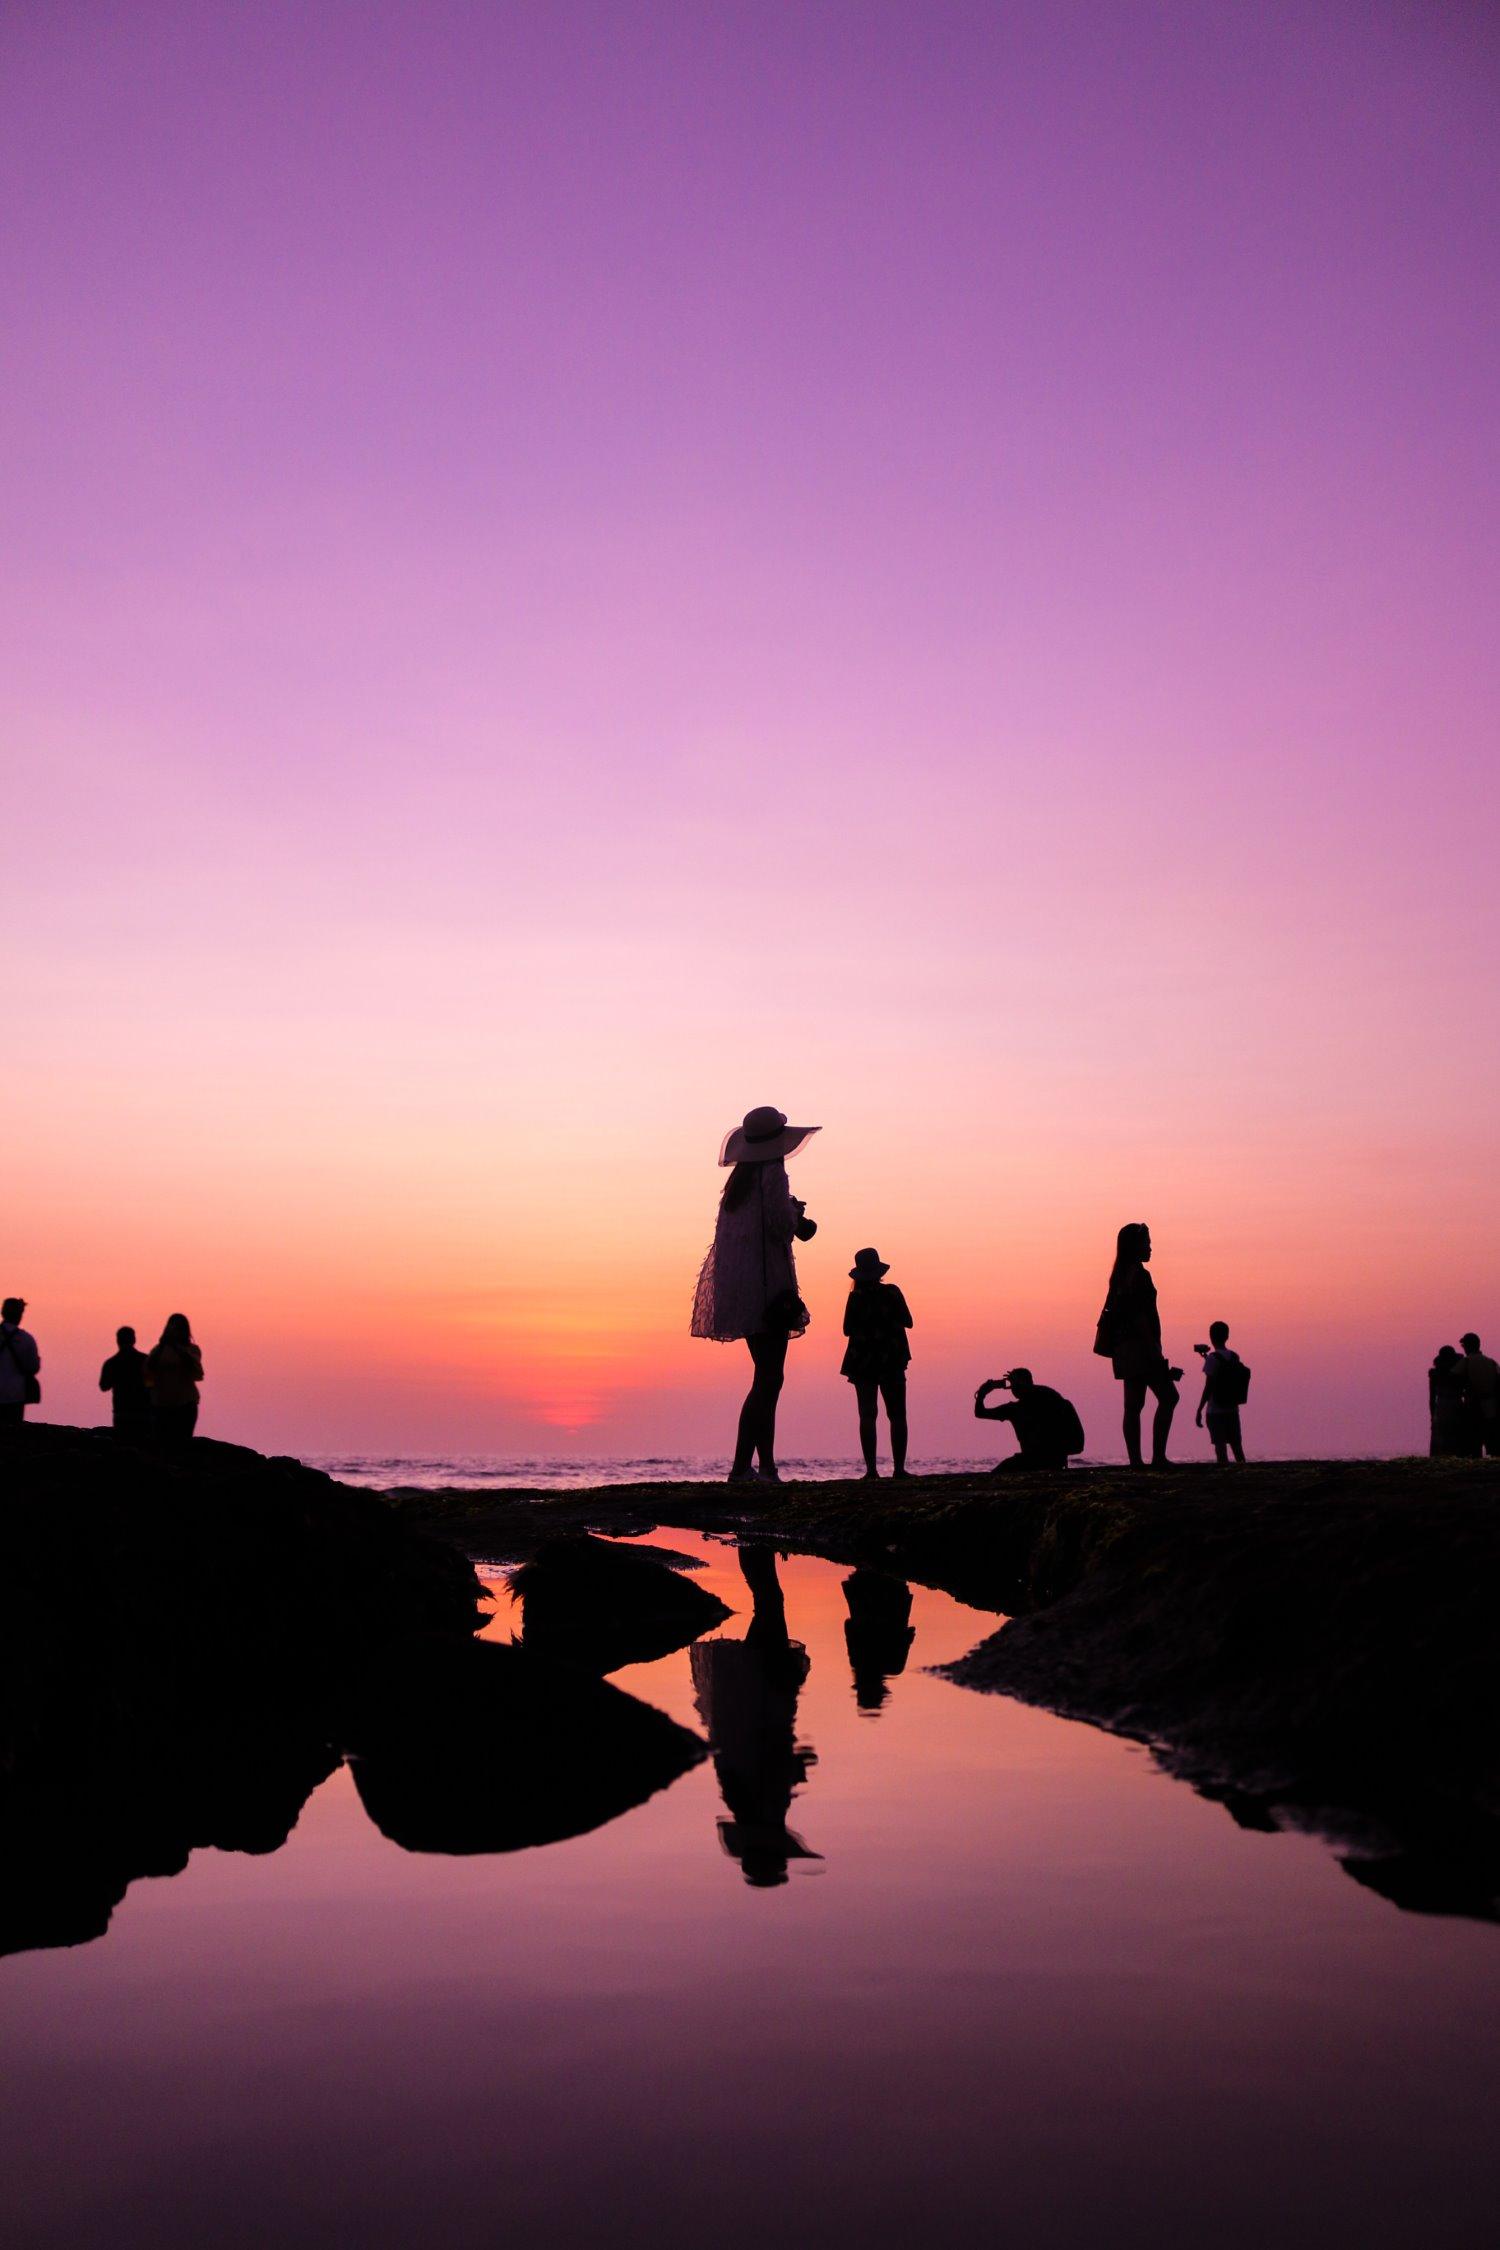 silhouettes on a beach